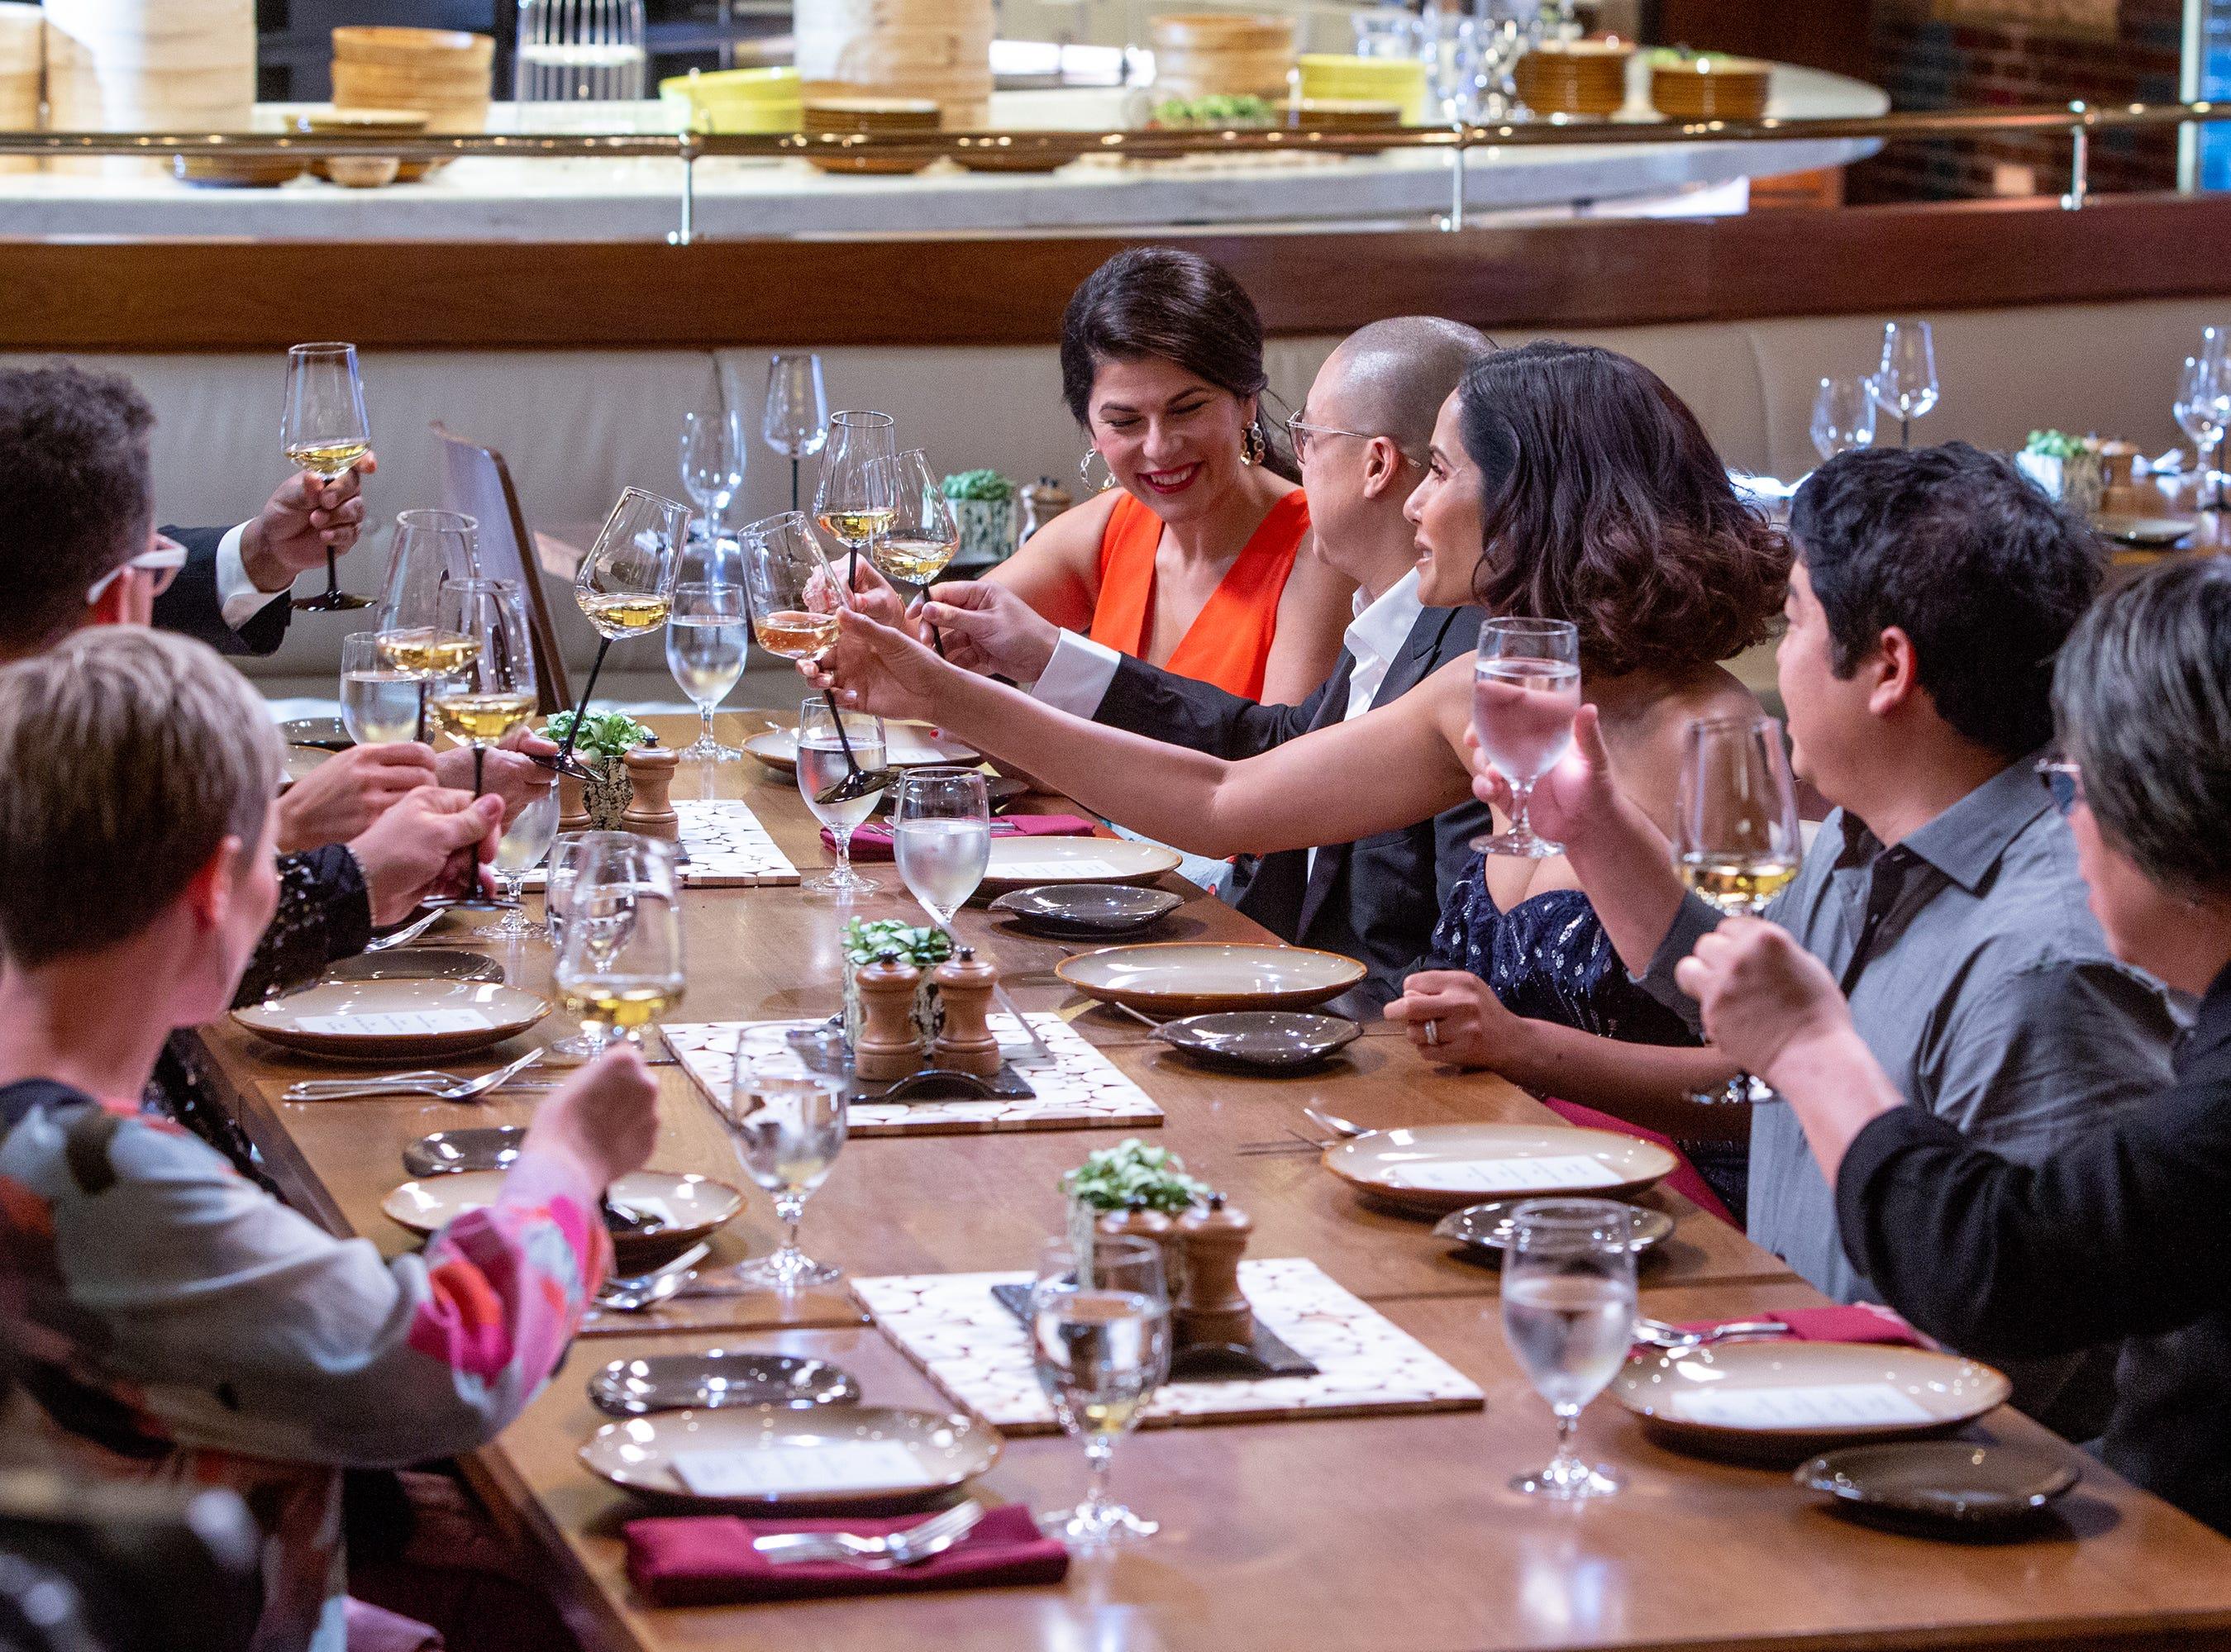 (Left to right) Nilou Motamed, Dan Hong, Padma Lakshmi, Mitsuharu Tsumura and Alvin Leung dine in episode 15 of 'Top Chef' Kentucky.